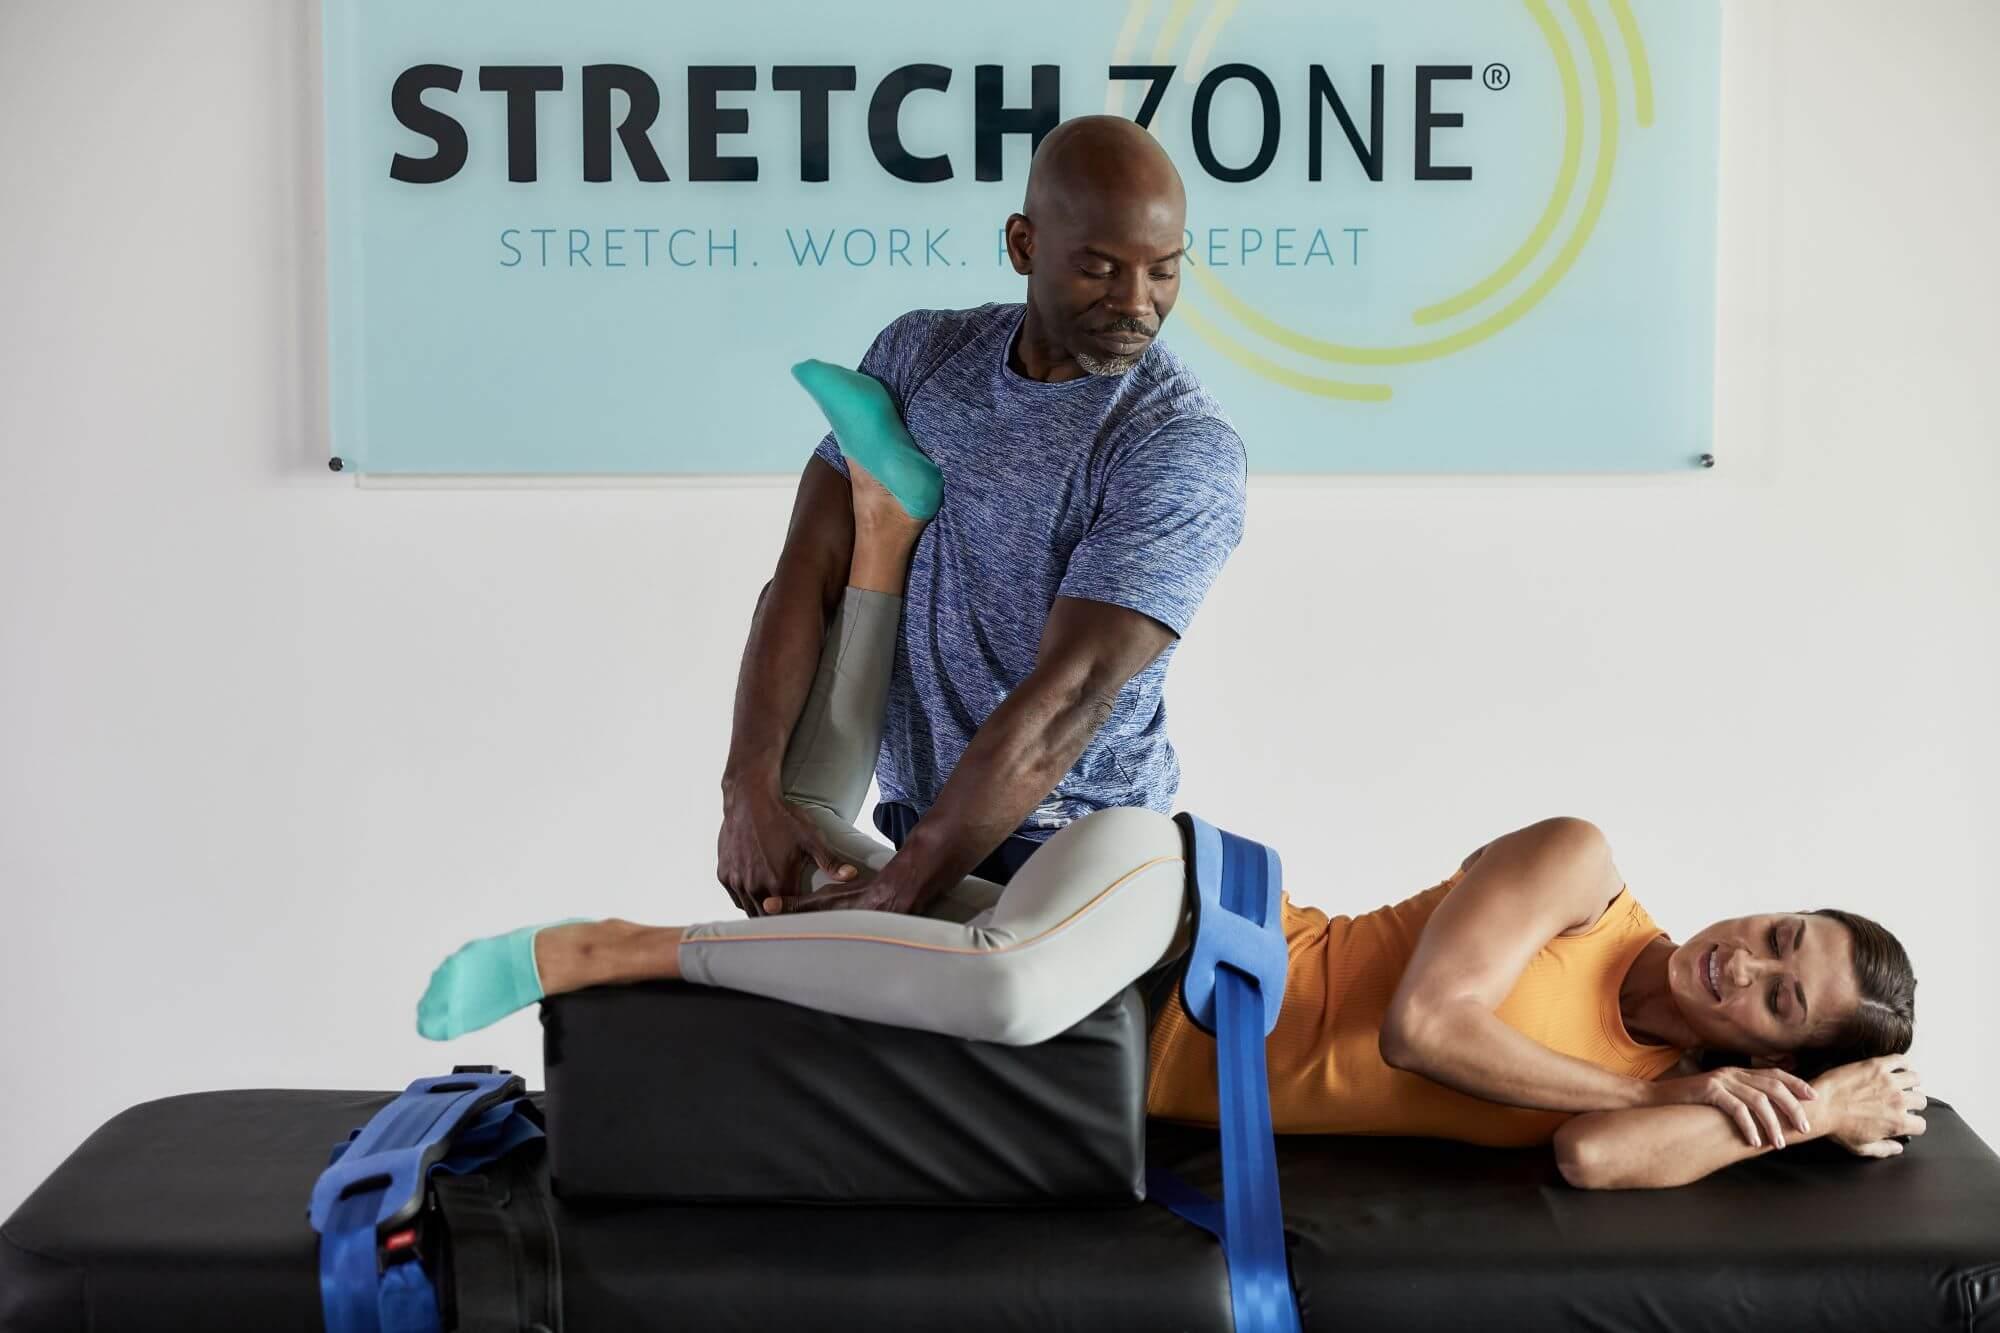 Stretch Zone South Florida